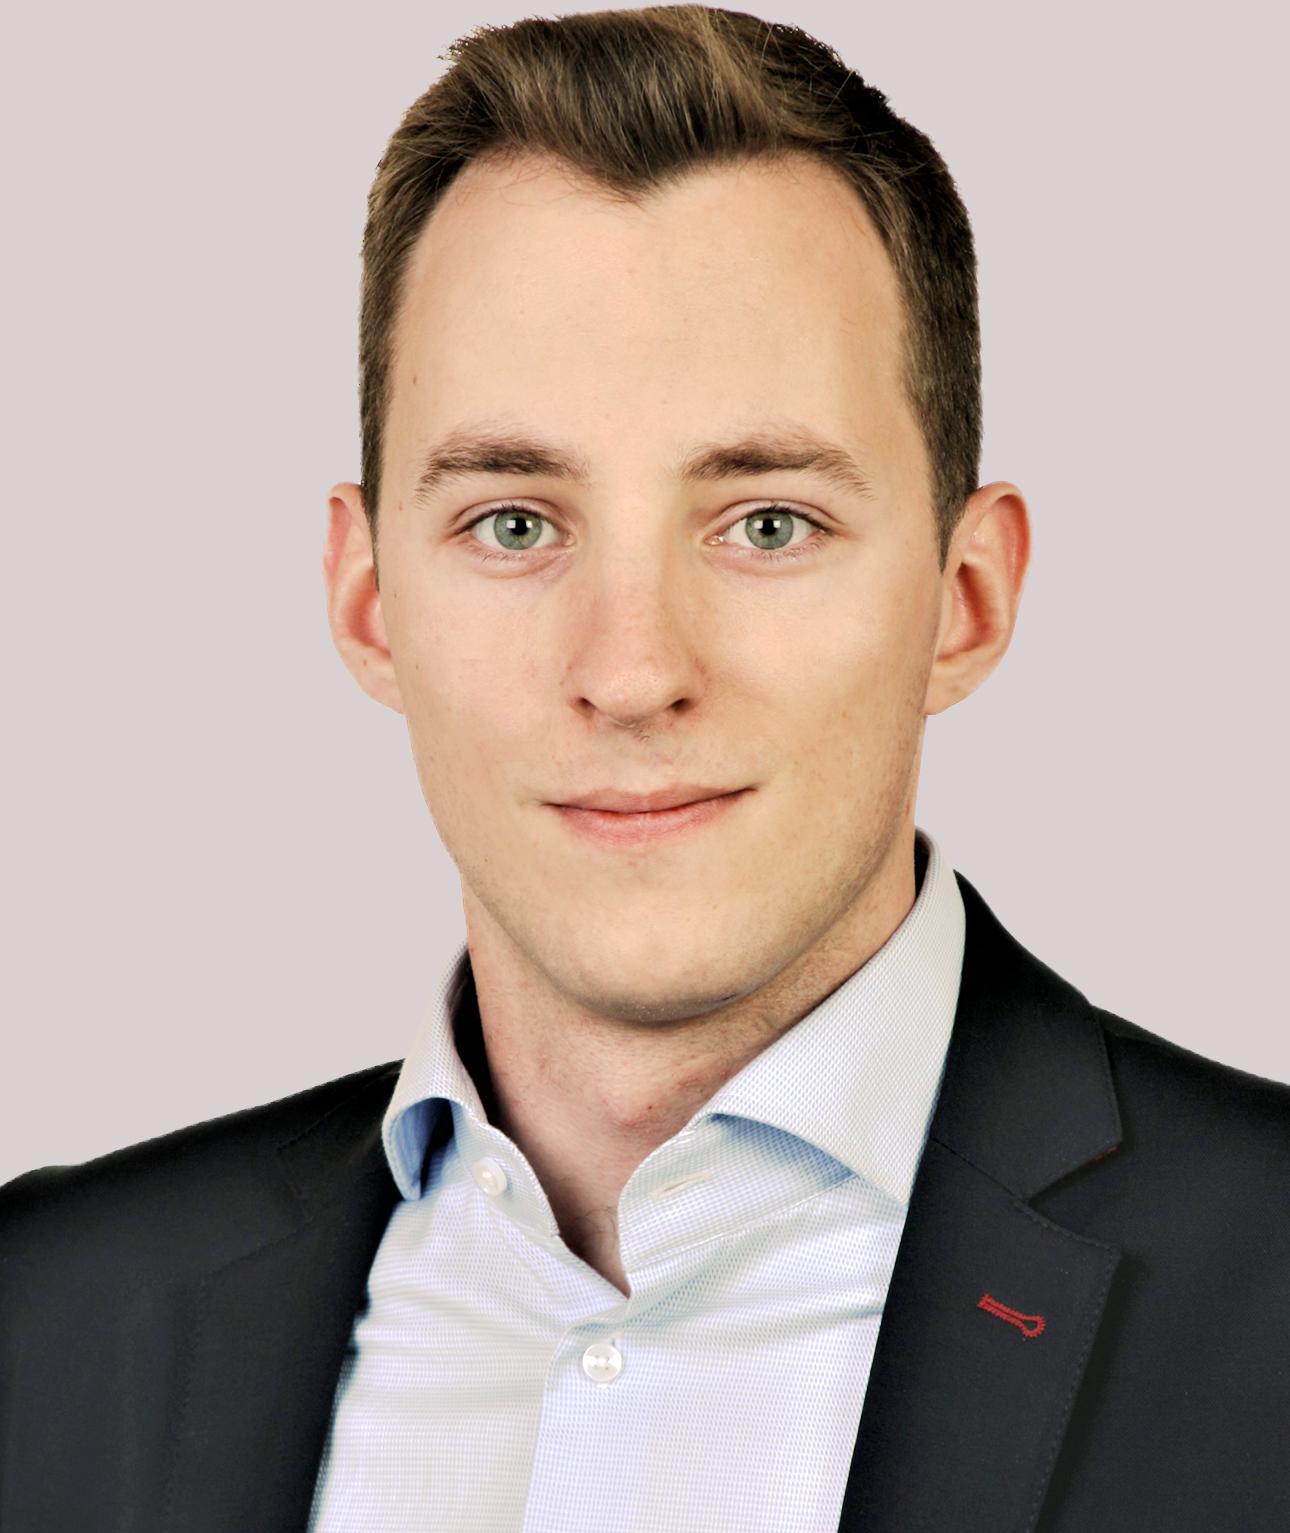 Marcin Nawrot